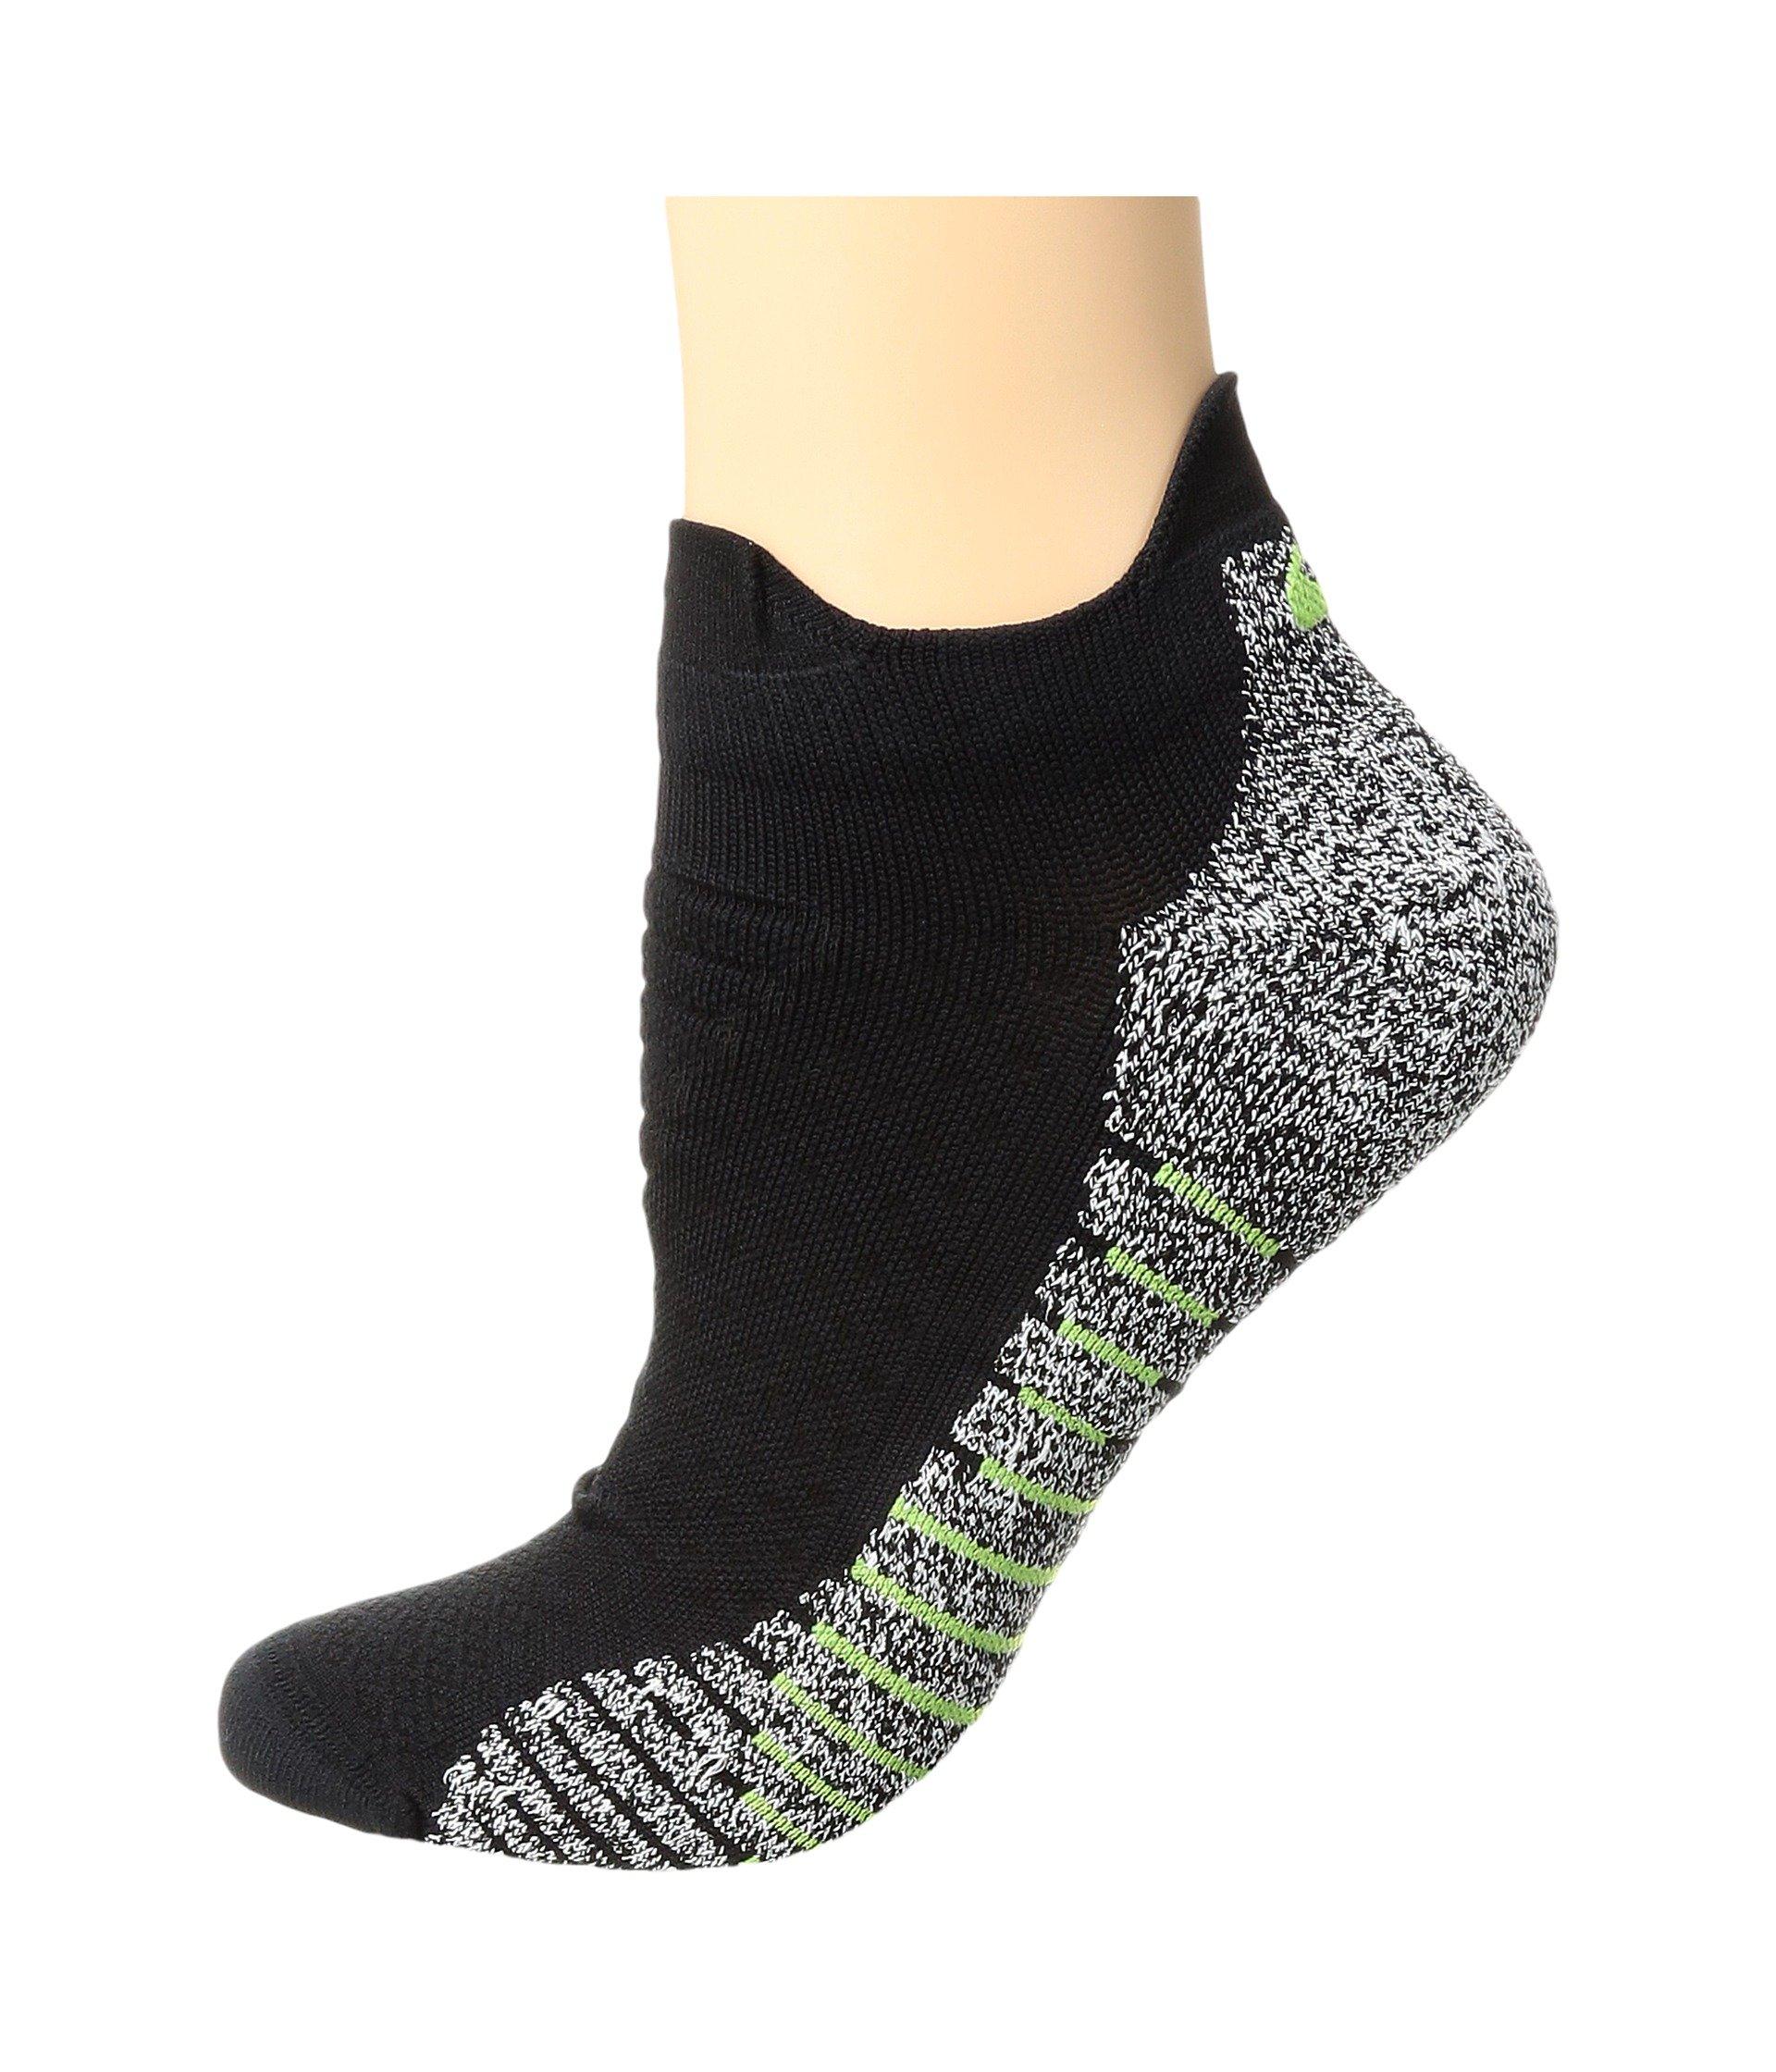 8ae8f2ecc Nike Grip Lightweight Low Training Socks In Black/Volt | ModeSens